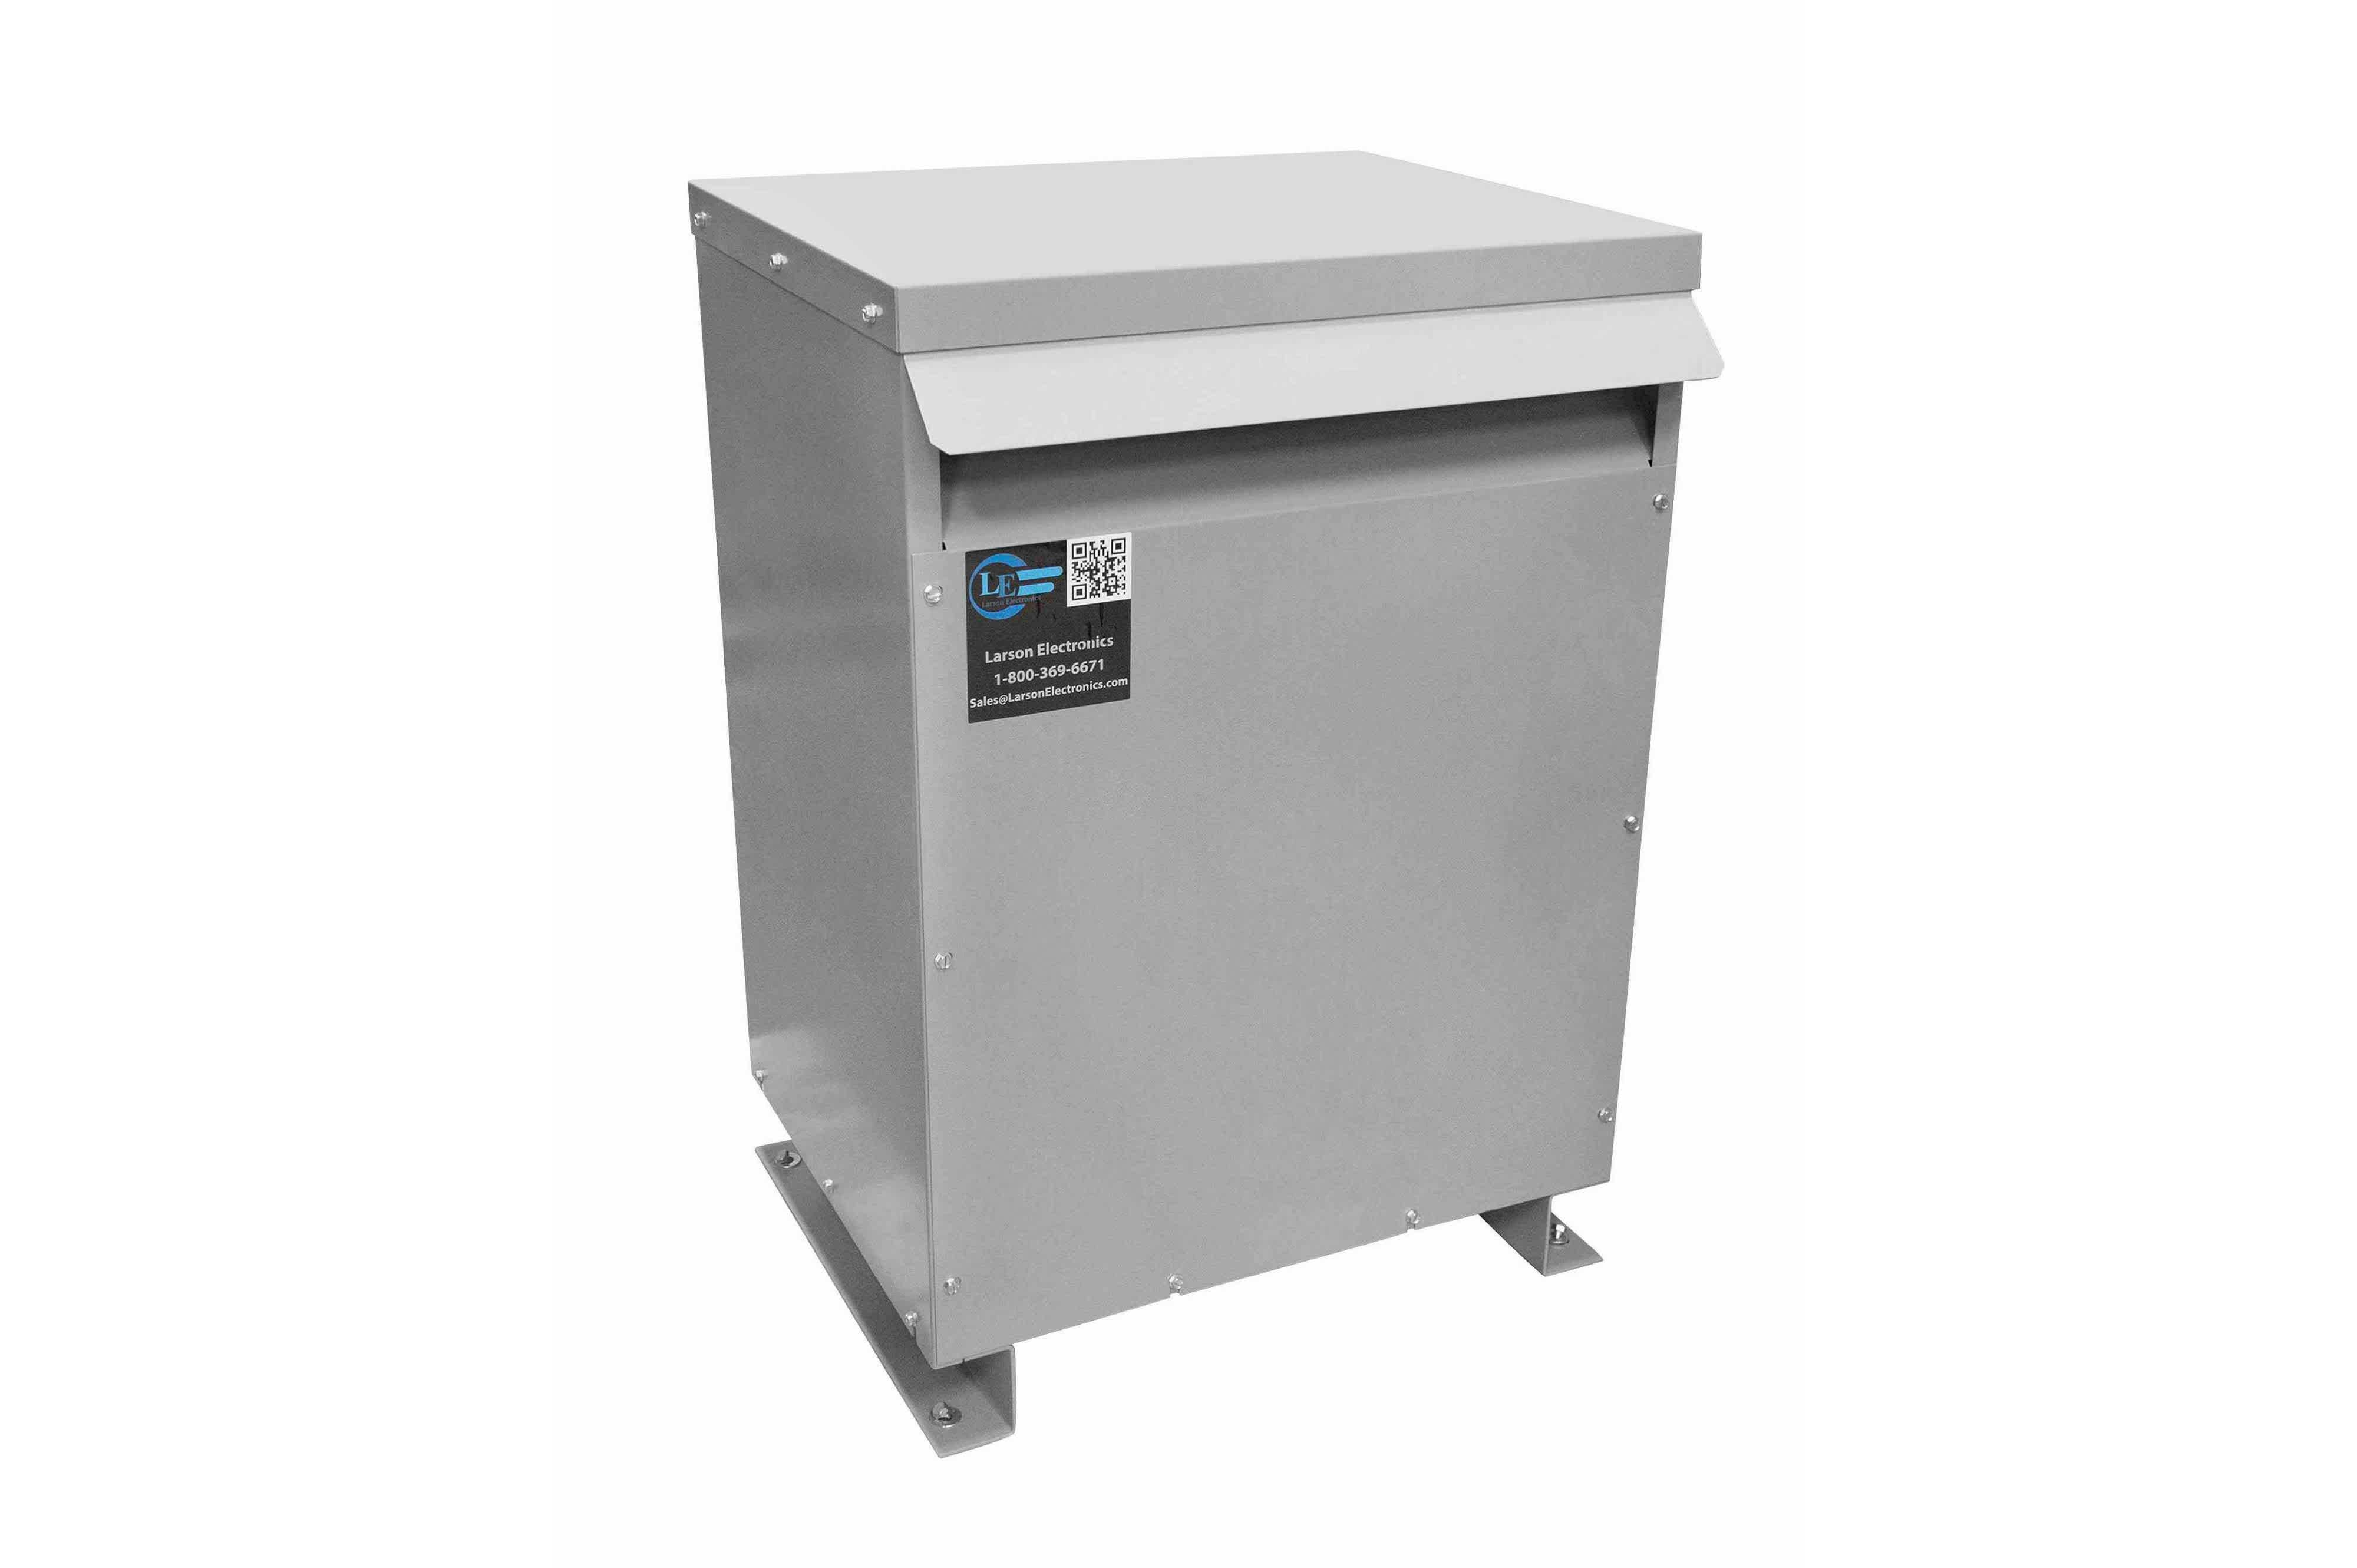 900 kVA 3PH Isolation Transformer, 240V Wye Primary, 400V Delta Secondary, N3R, Ventilated, 60 Hz